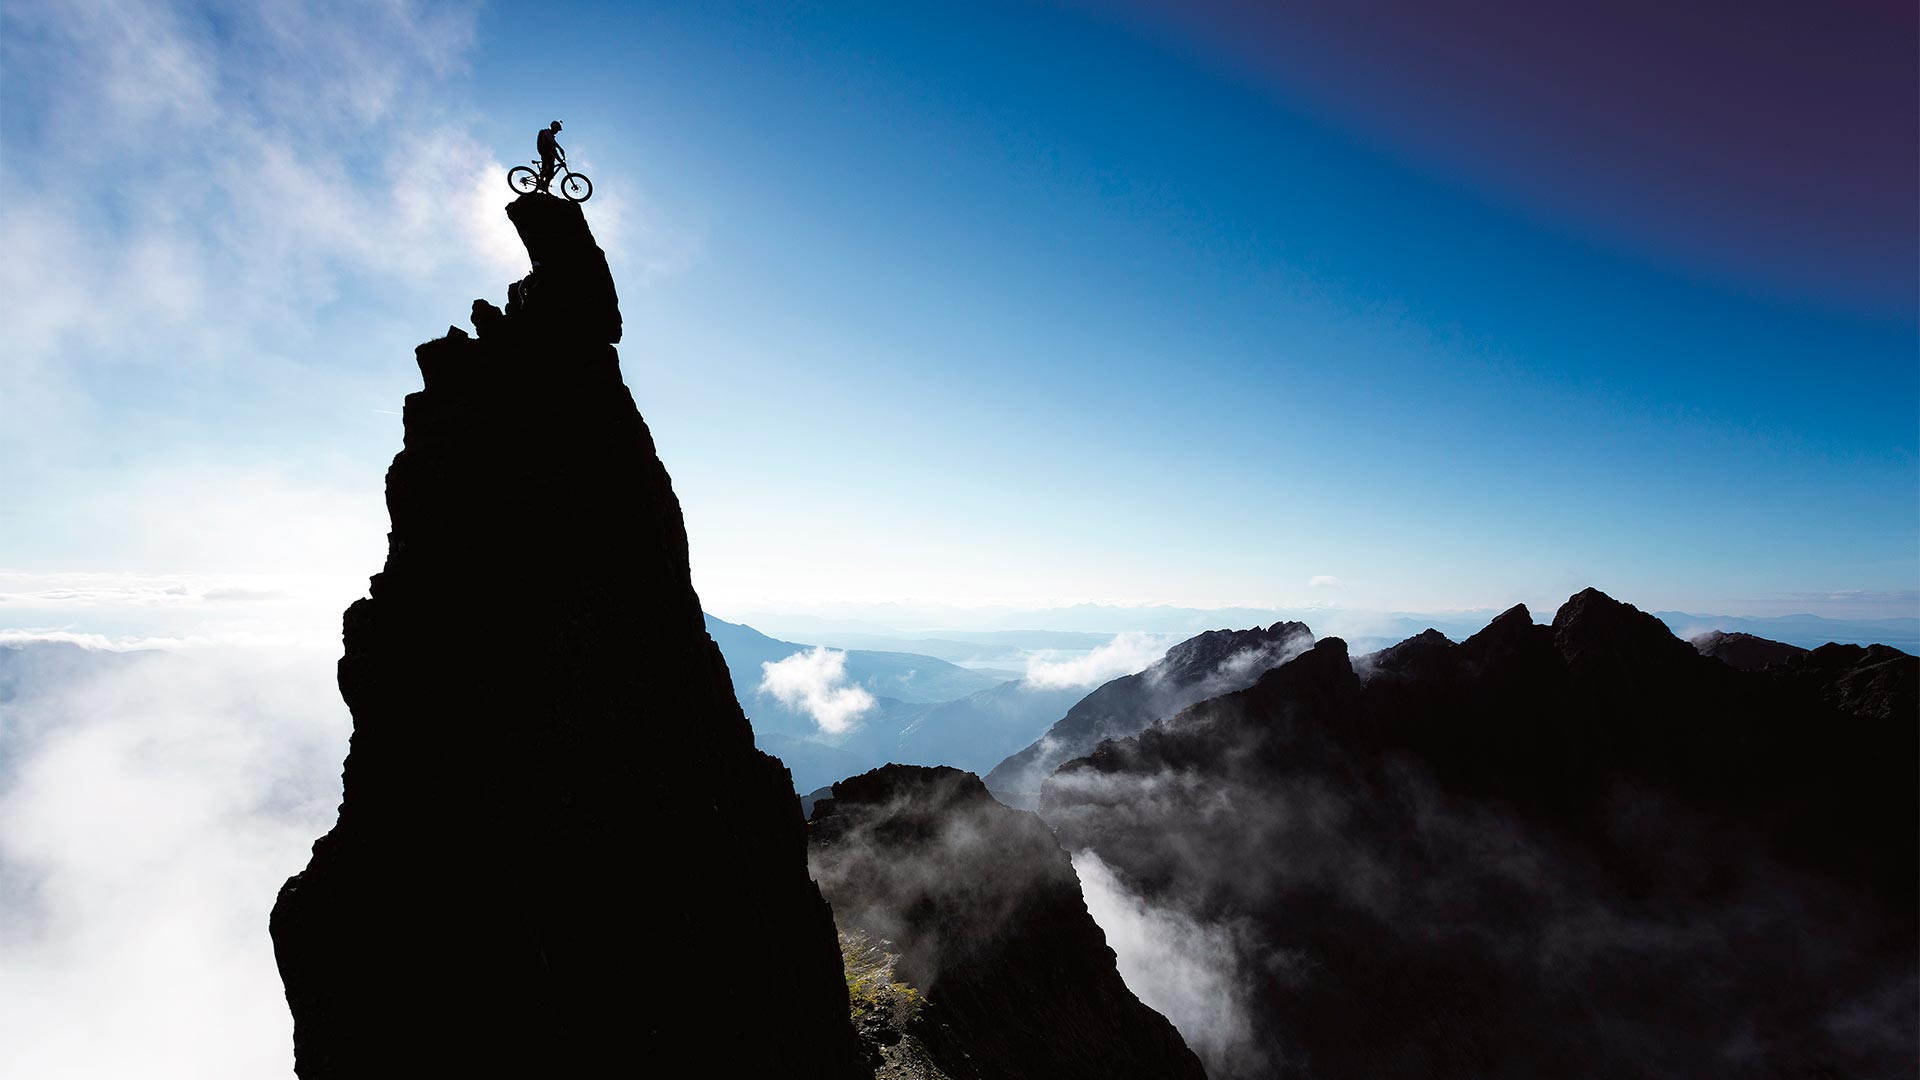 The Inaccessible Pinnacle on the Isle of Skye, Scotland